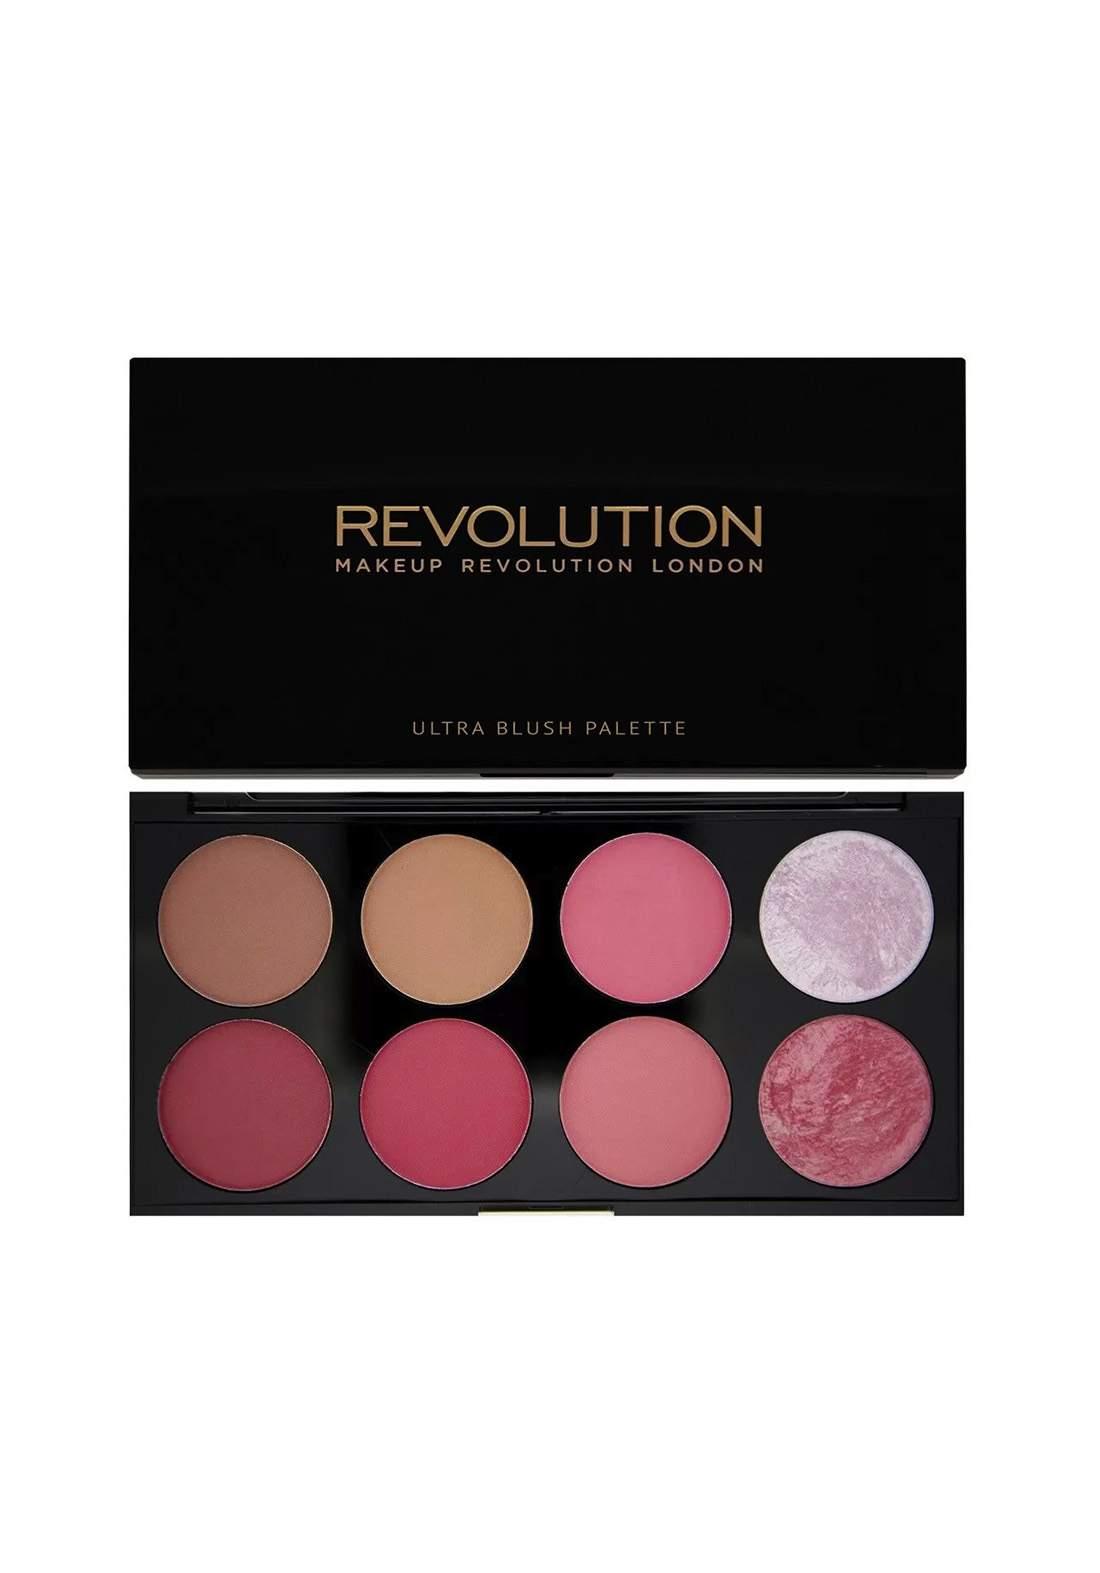 Makeup Revolution London Blush Palette Skaistalai 13g علبة ظلال